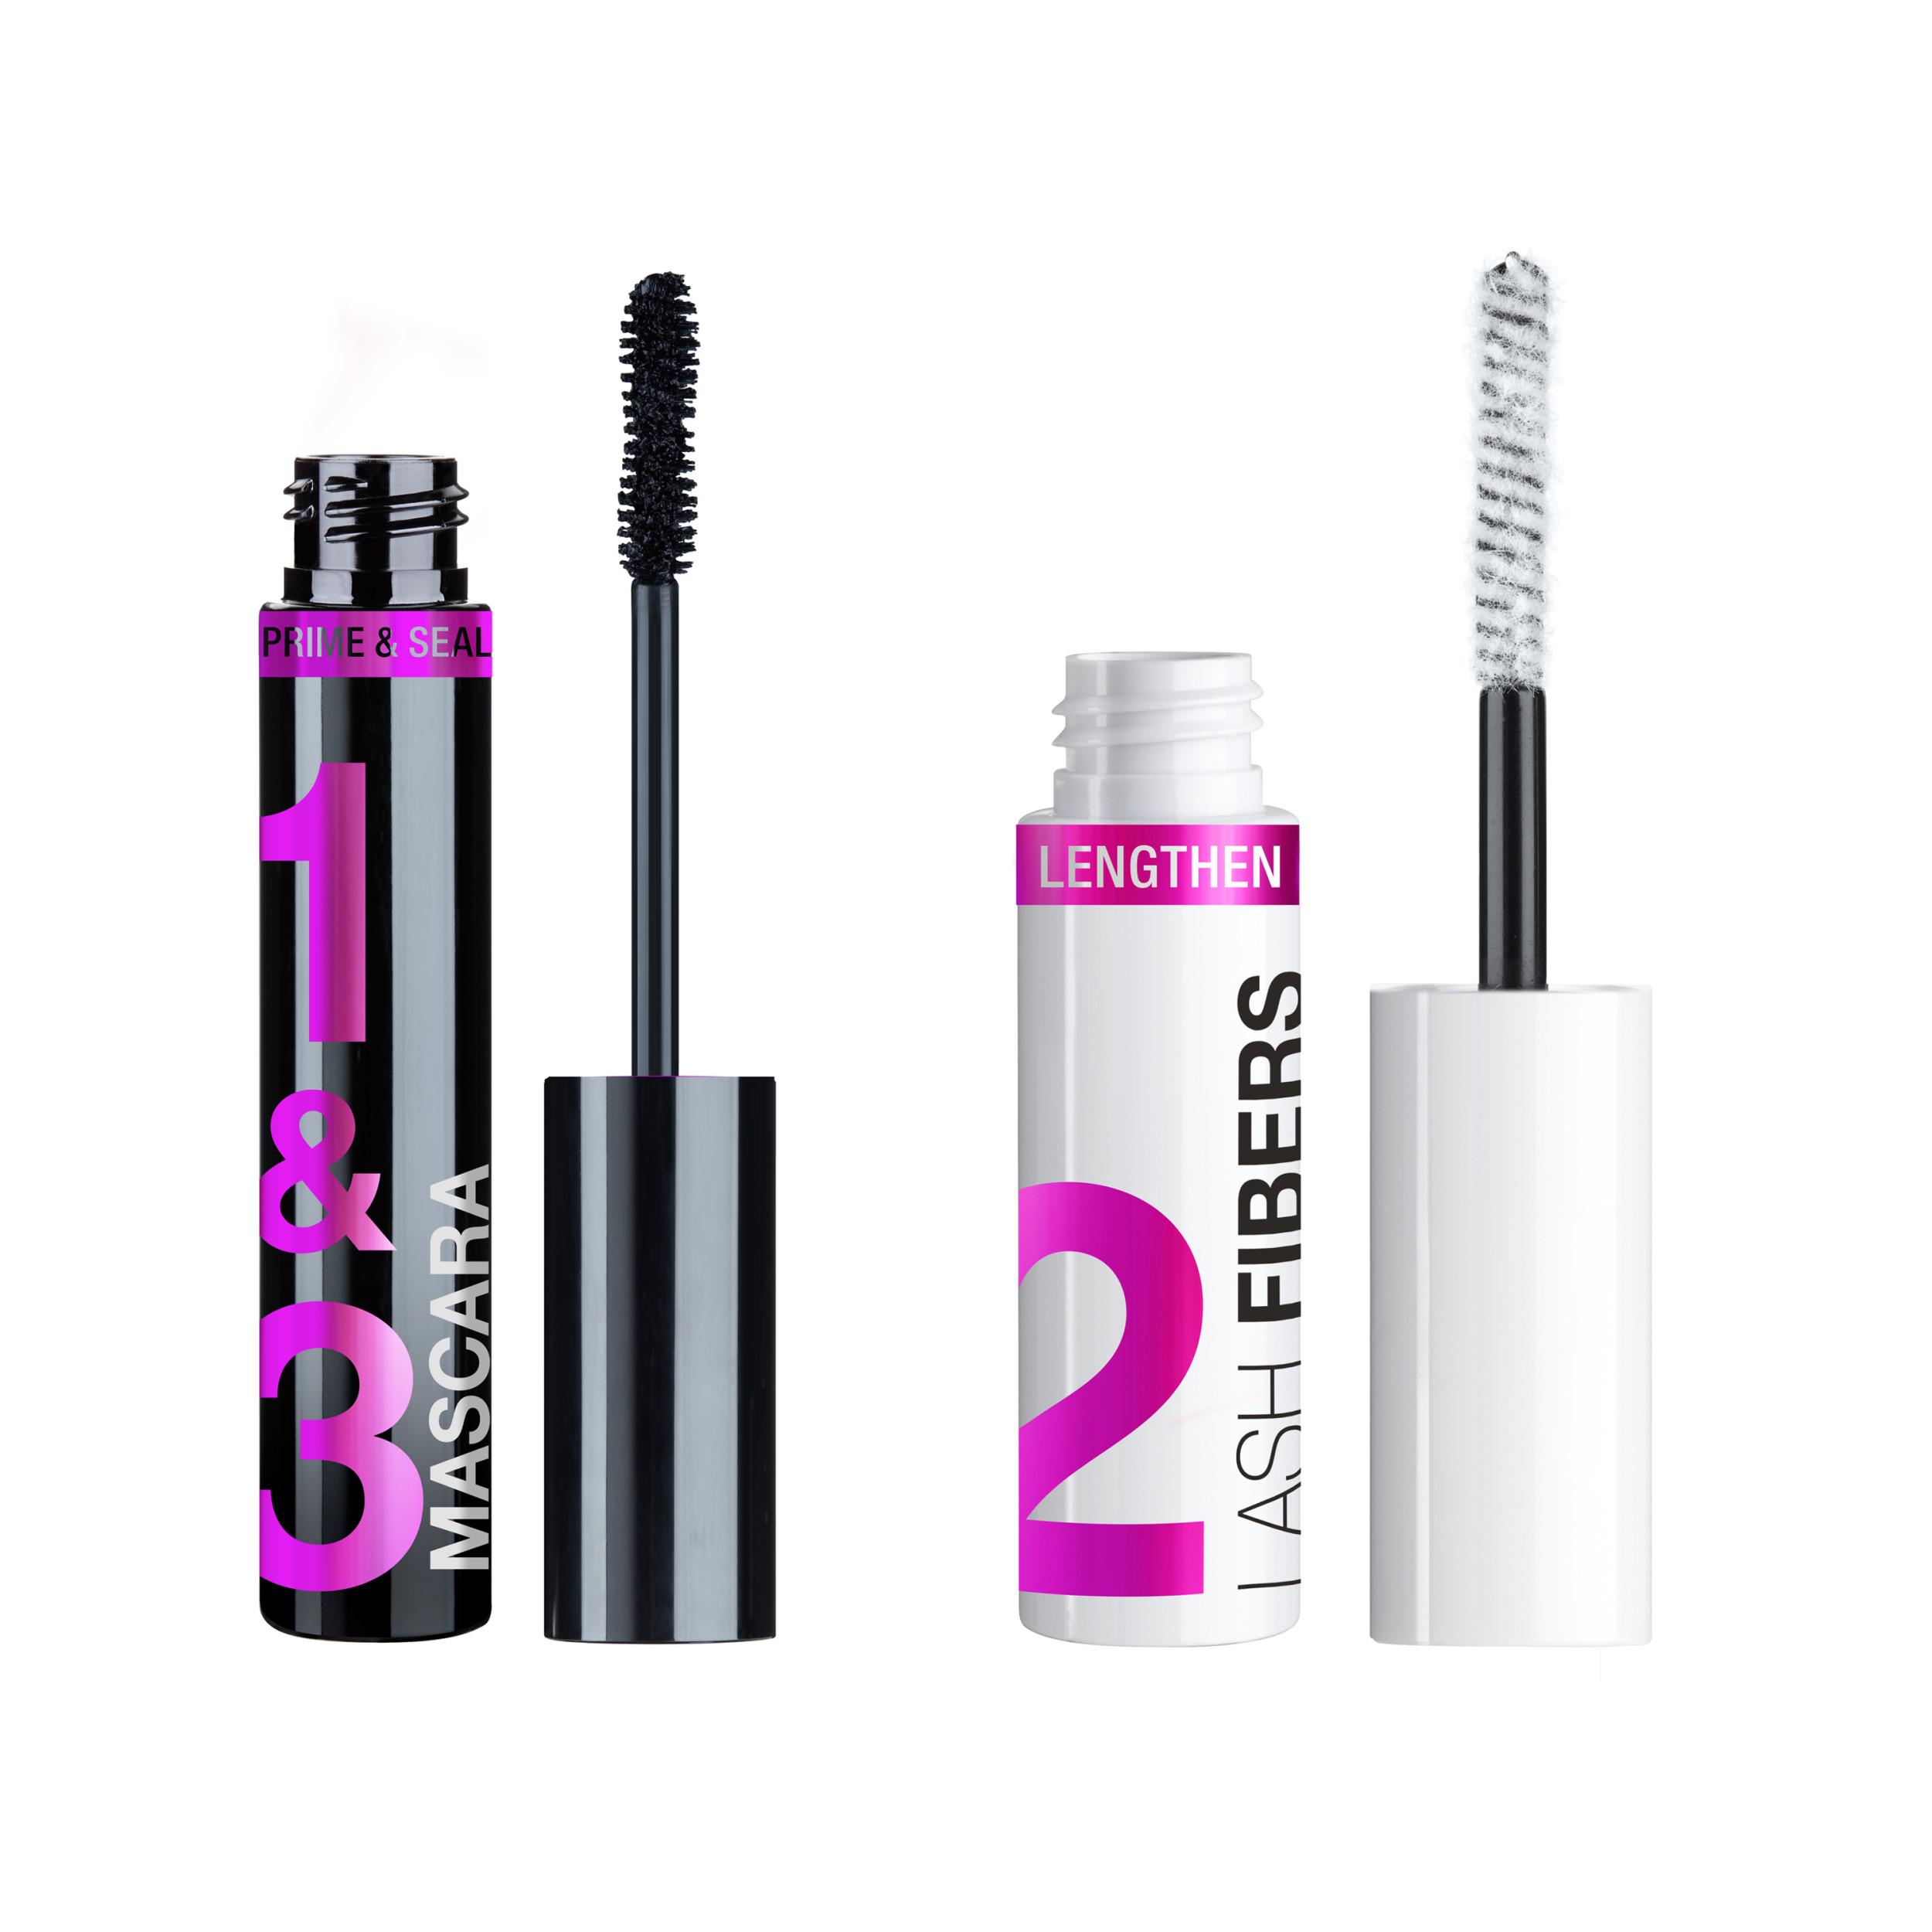 wet n wild Lash-O-Matic Mascara + Fiber Extension Kit, Very Black